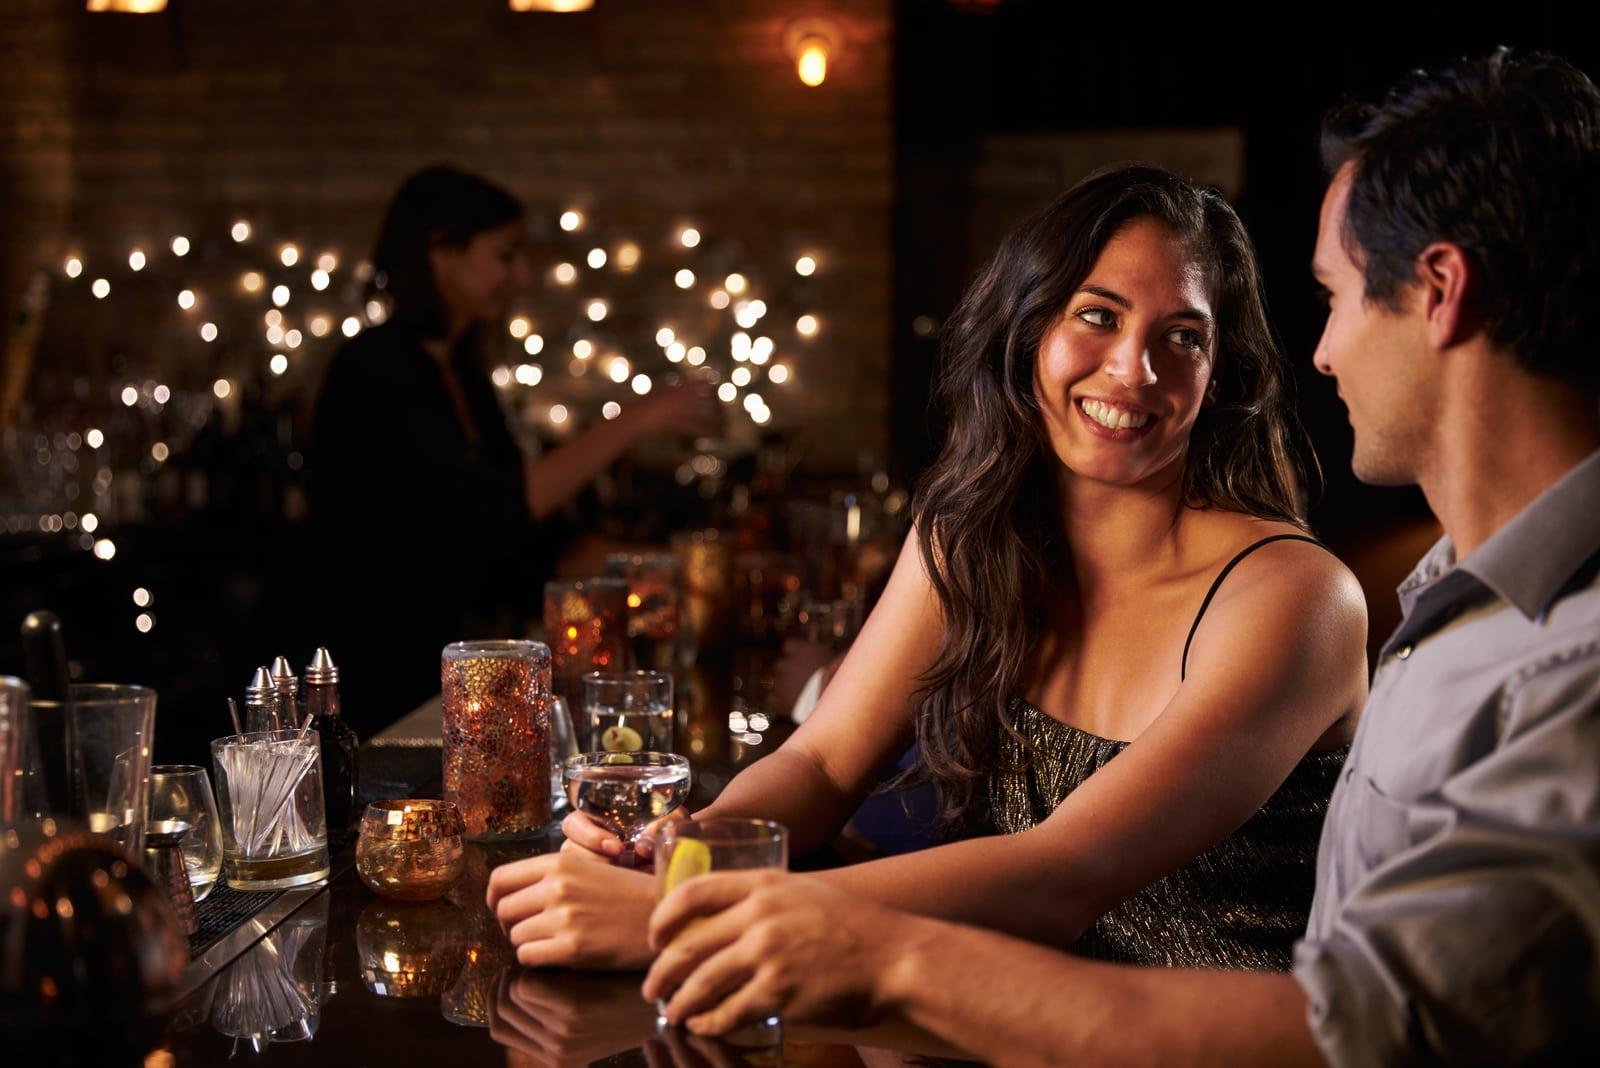 Couple Enjoying Night Out At Cocktail Bar